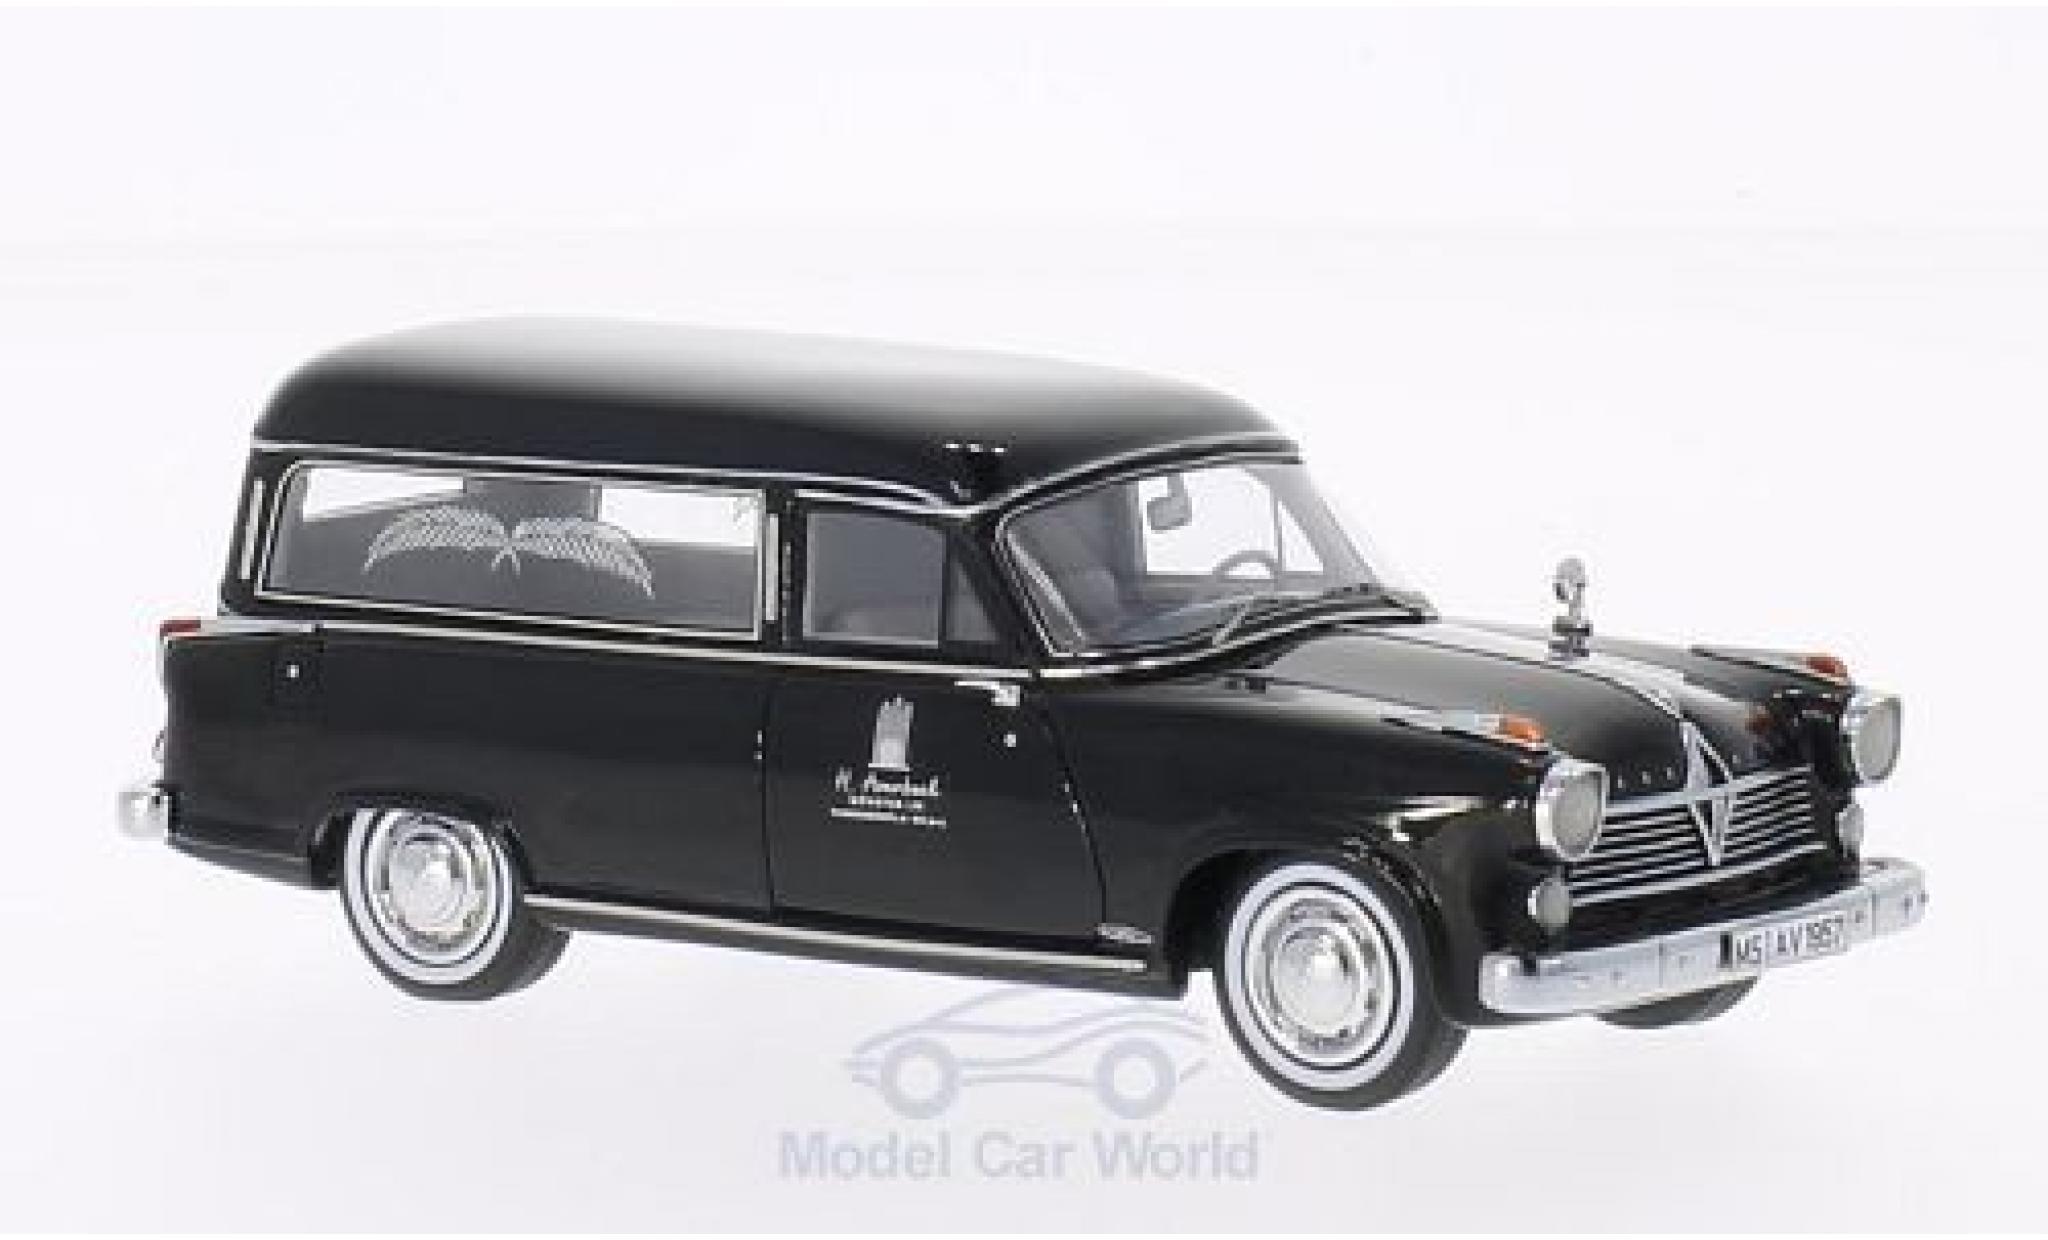 Borgward Hansa 2400 1/43 Neo Rappold noire 1957 Bestattungswagen